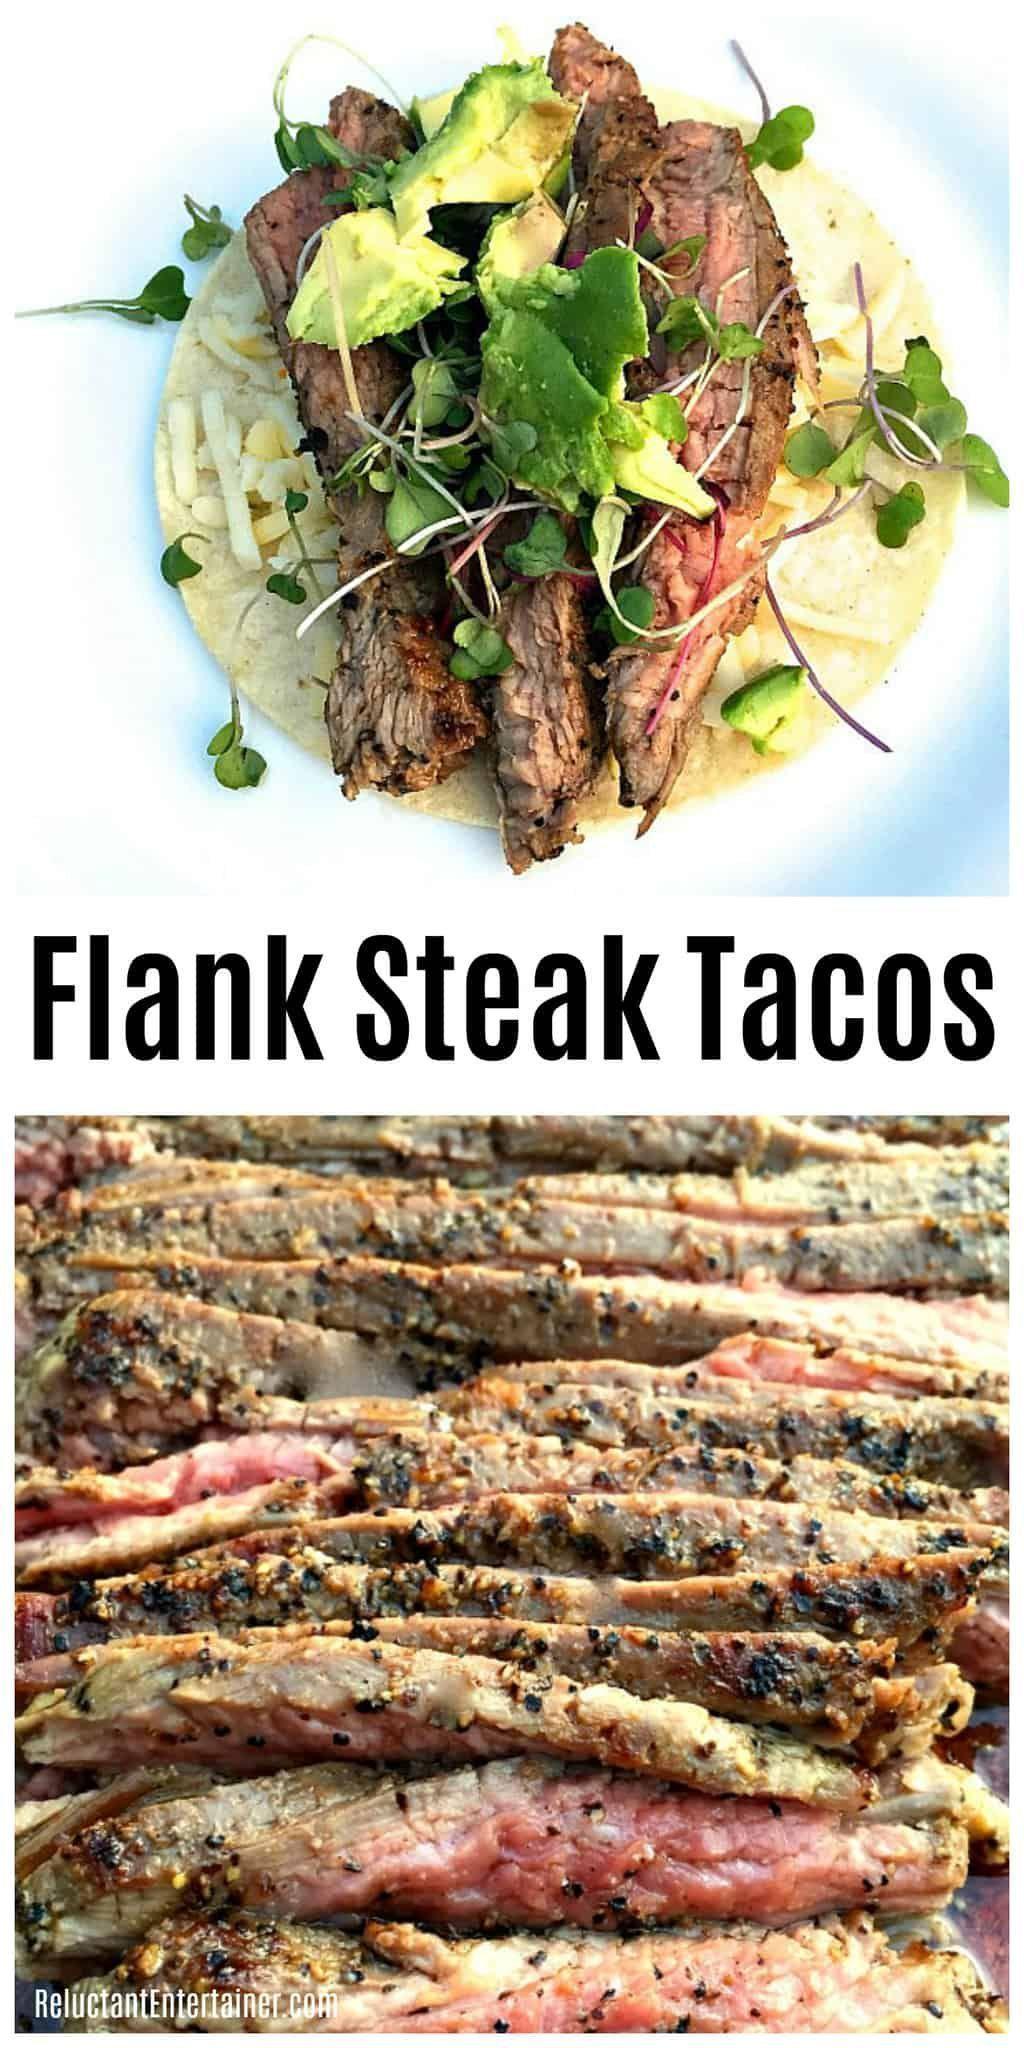 Flank Steak Tacos #easyrecipe #flanksteaktacos #tacos #20minuterecipe via @sandycoughlin #flanksteaktacos Flank Steak Tacos #easyrecipe #flanksteaktacos #tacos #20minuterecipe via @sandycoughlin #flanksteaktacos Flank Steak Tacos #easyrecipe #flanksteaktacos #tacos #20minuterecipe via @sandycoughlin #flanksteaktacos Flank Steak Tacos #easyrecipe #flanksteaktacos #tacos #20minuterecipe via @sandycoughlin #flanksteaktacos Flank Steak Tacos #easyrecipe #flanksteaktacos #tacos #20minuterecipe via @s #flanksteaktacos